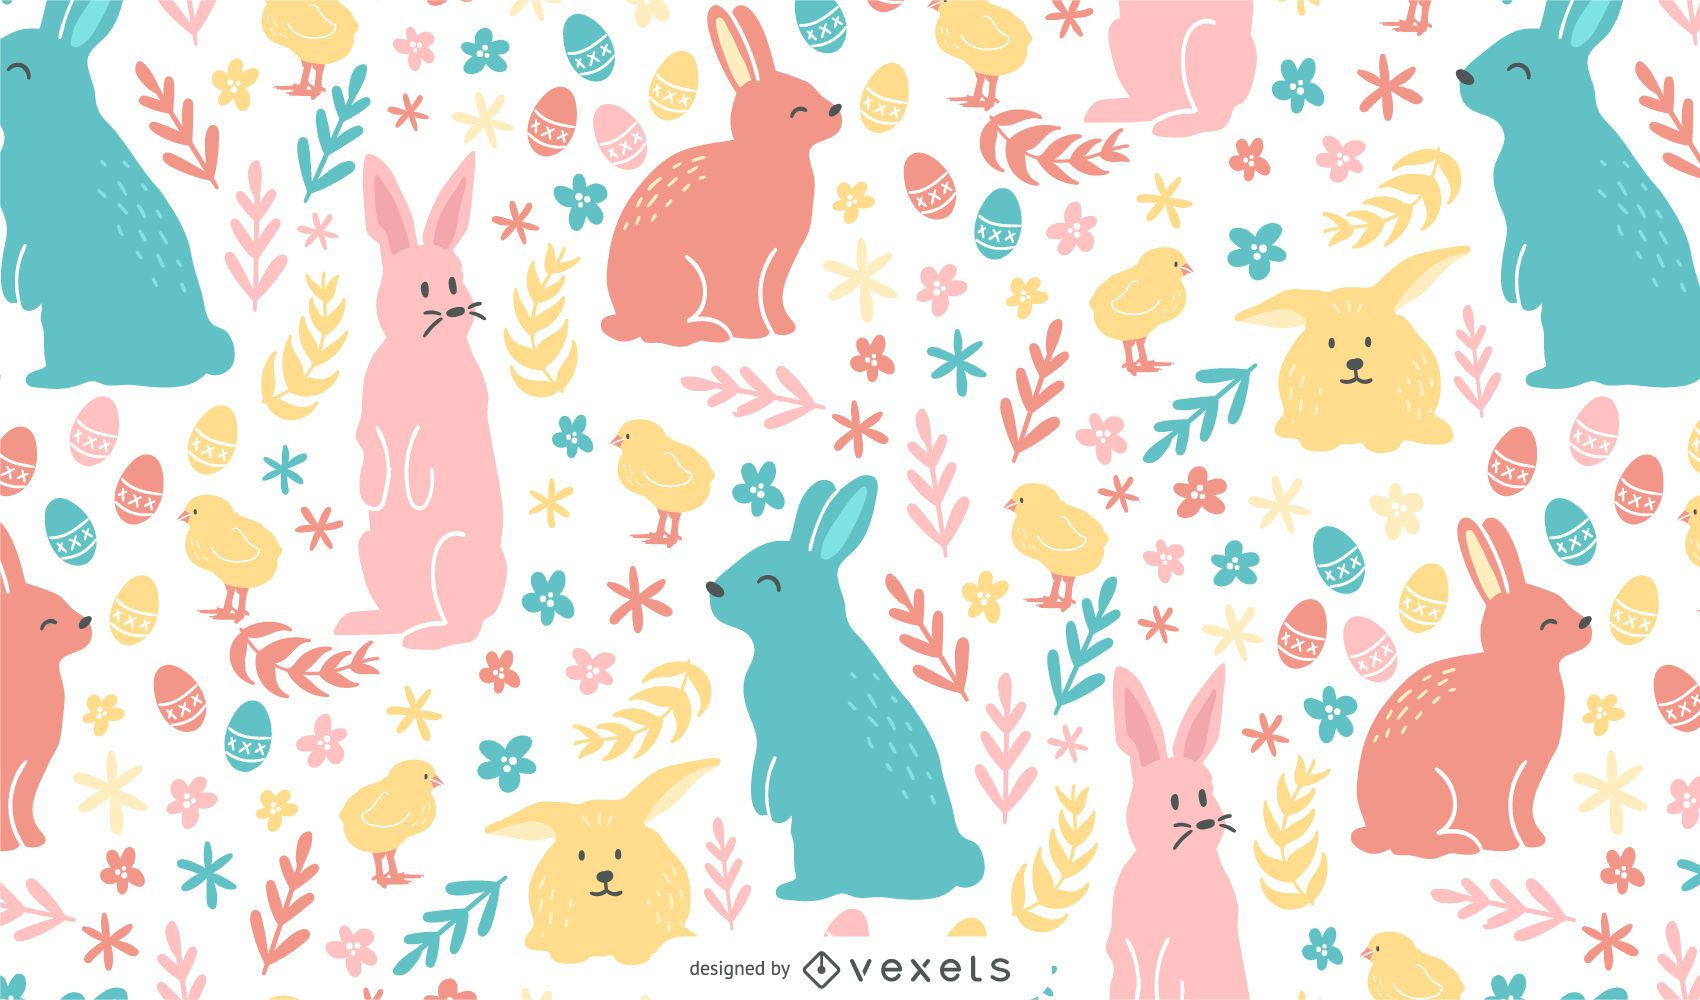 Colorful easter pattern design